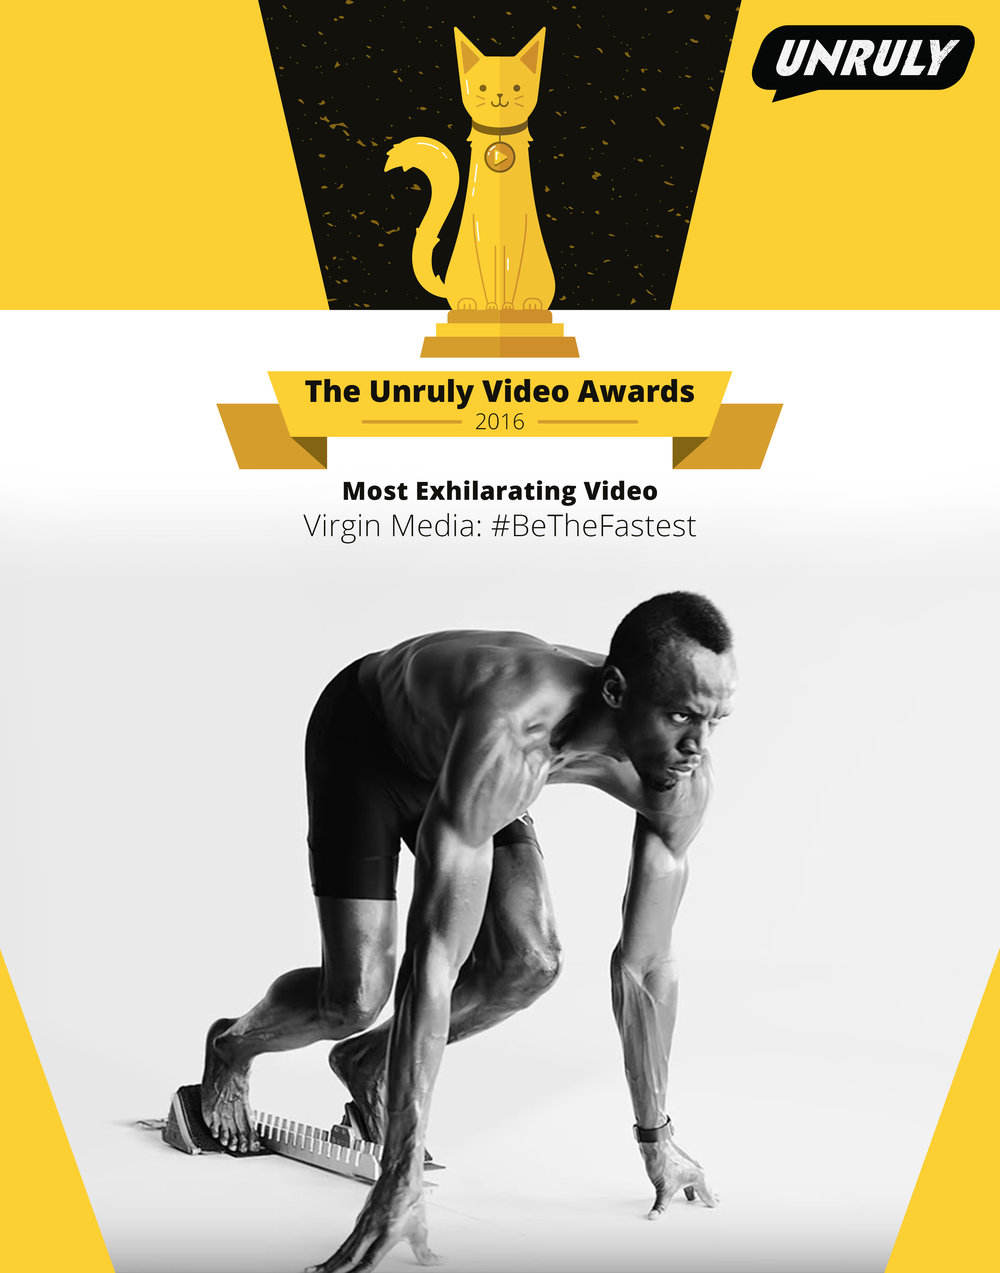 Unruly Video Awards_Physical Award_Virgin Media.jpg